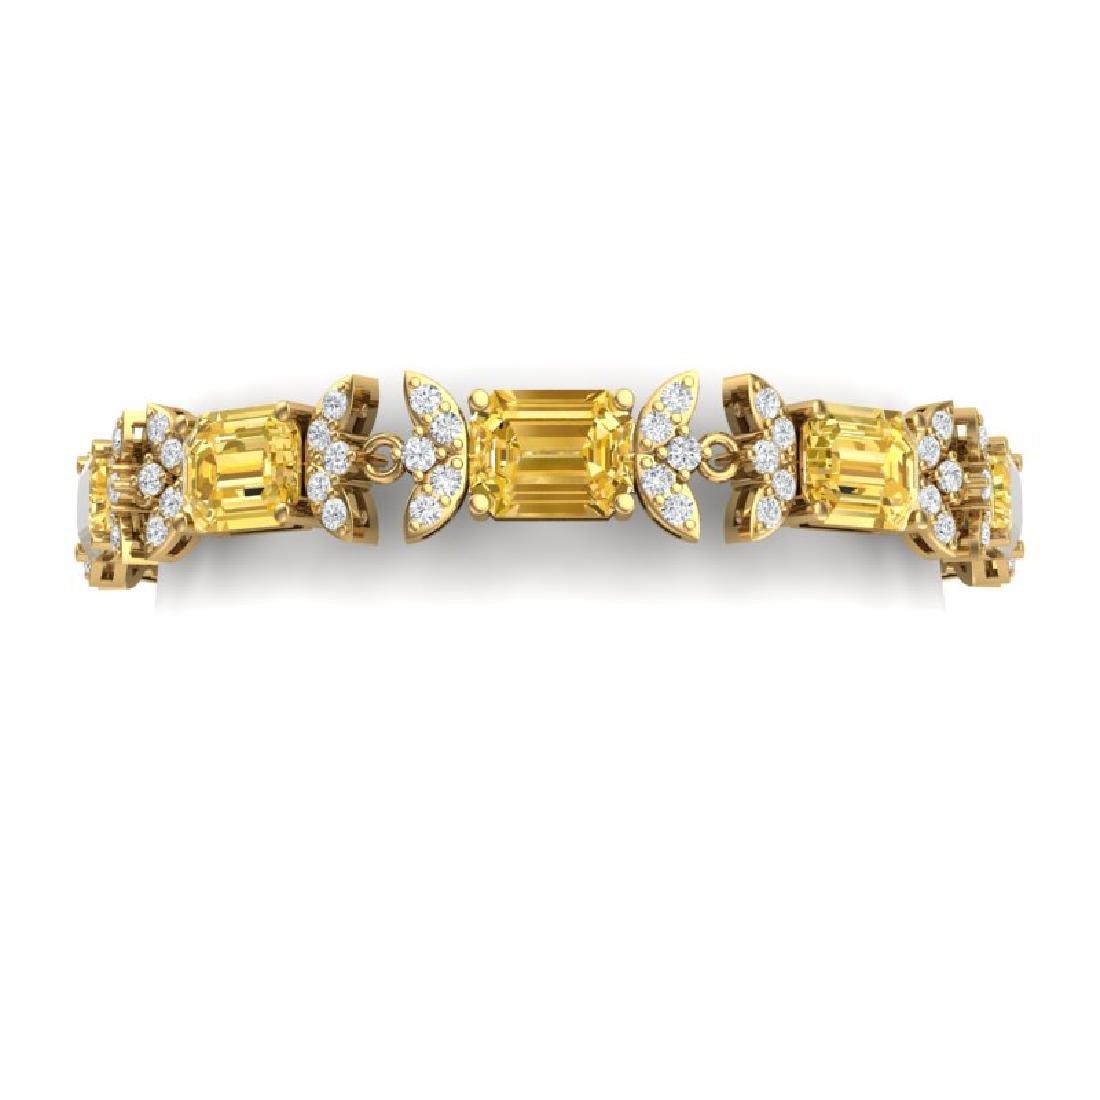 35.21 CTW Royalty Canary Citrine & VS Diamond Bracelet